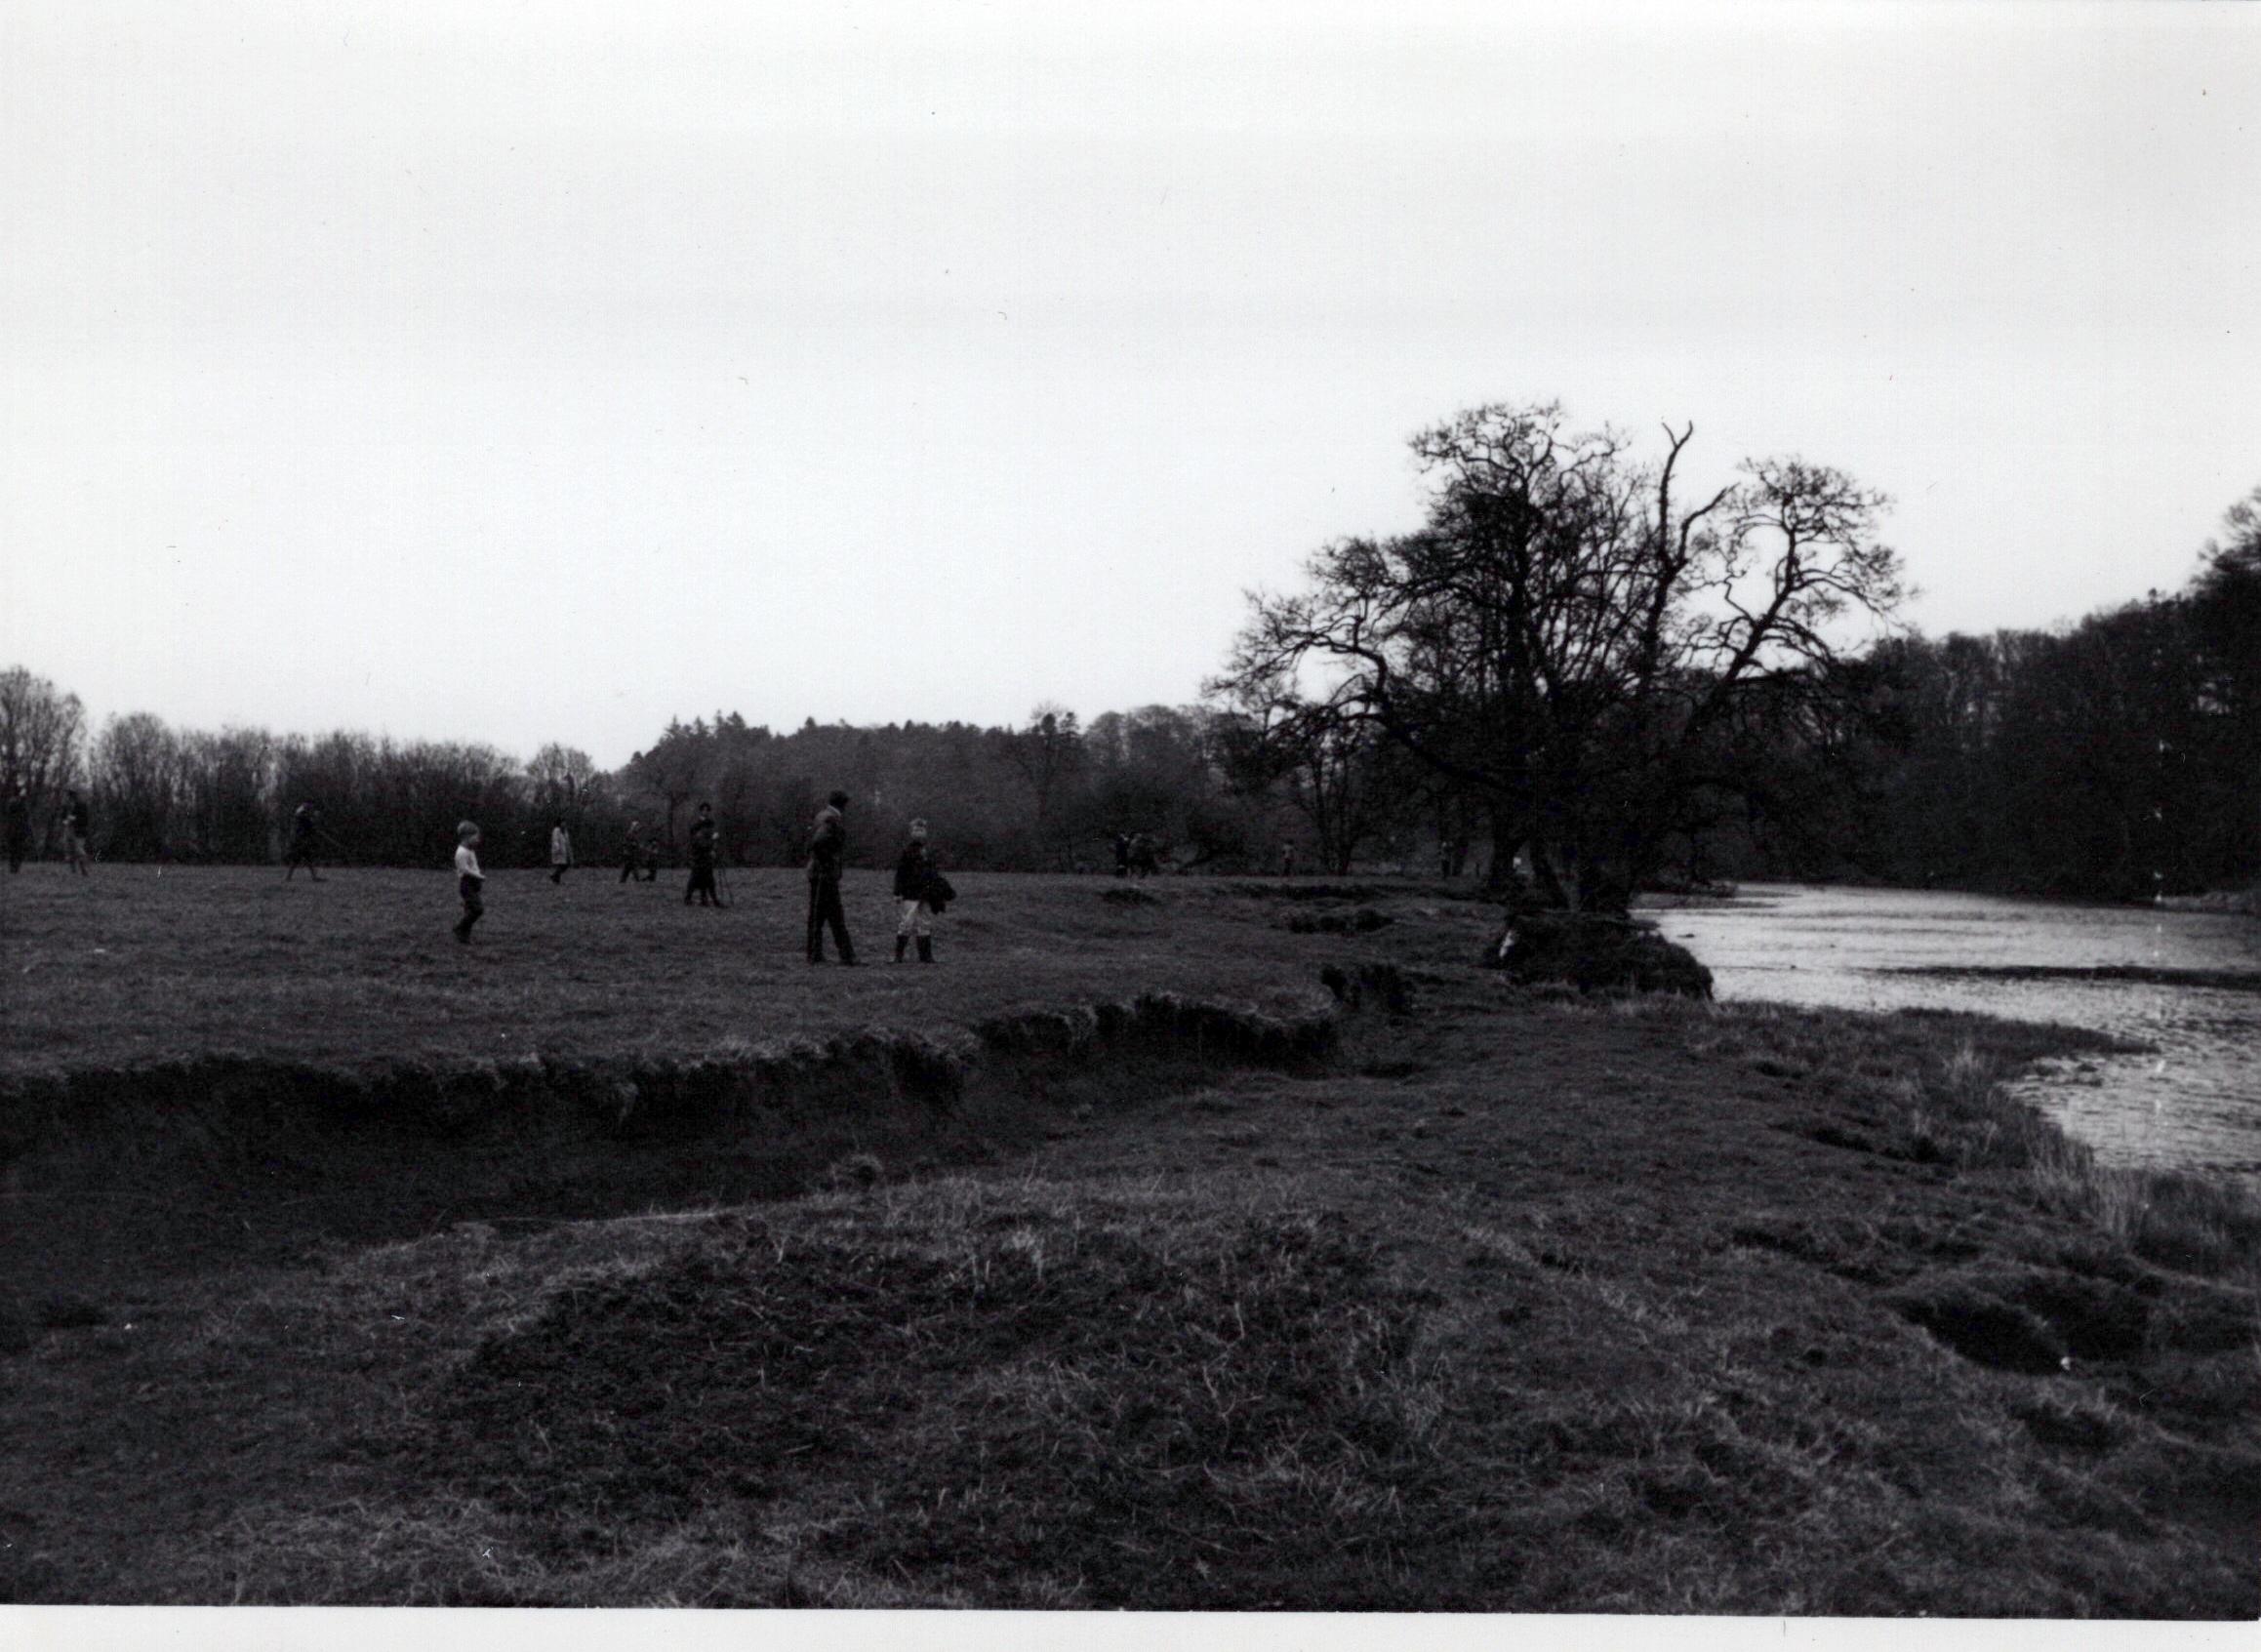 1970_Mei_Otterhound-Schotland_0026_a